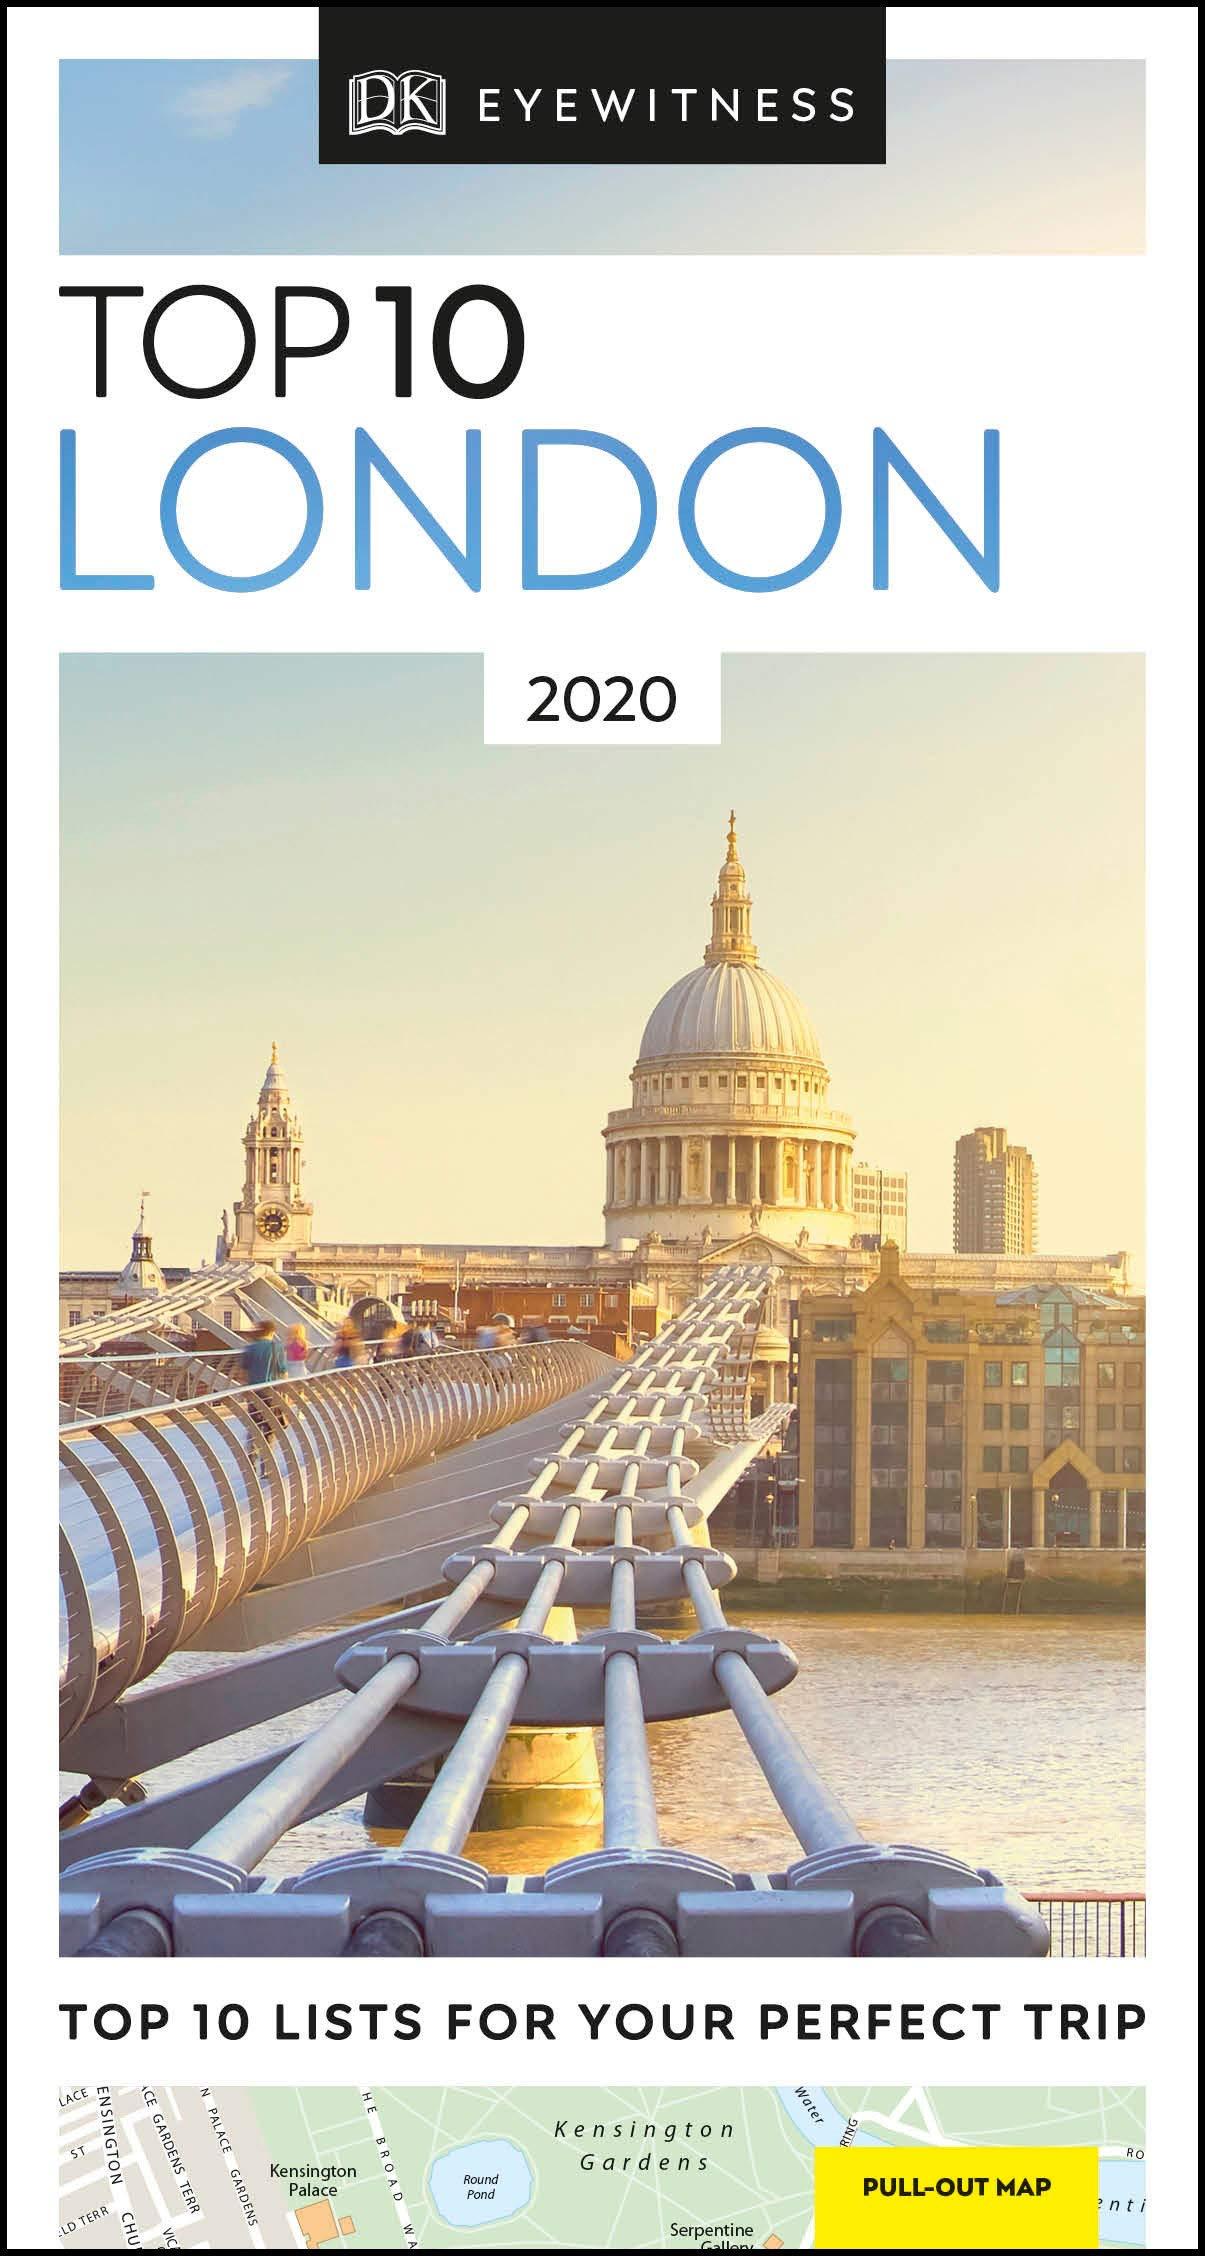 Top 10 London (2020 Edition)